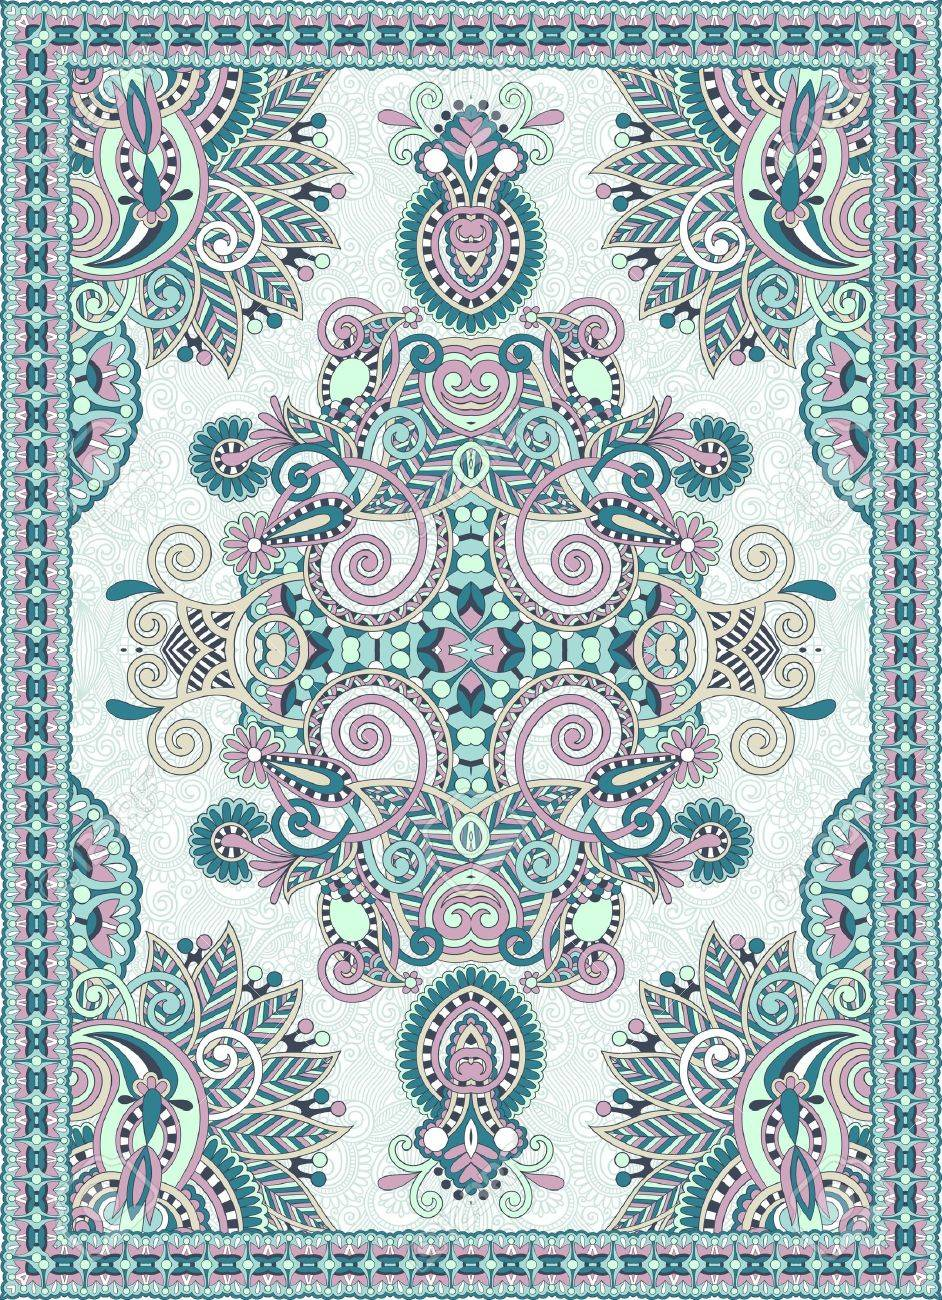 Ukrainian oriental floral ornamental seamless carpet design ukrainian oriental floral ornamental seamless carpet design stock vector 15542293 baanklon Choice Image